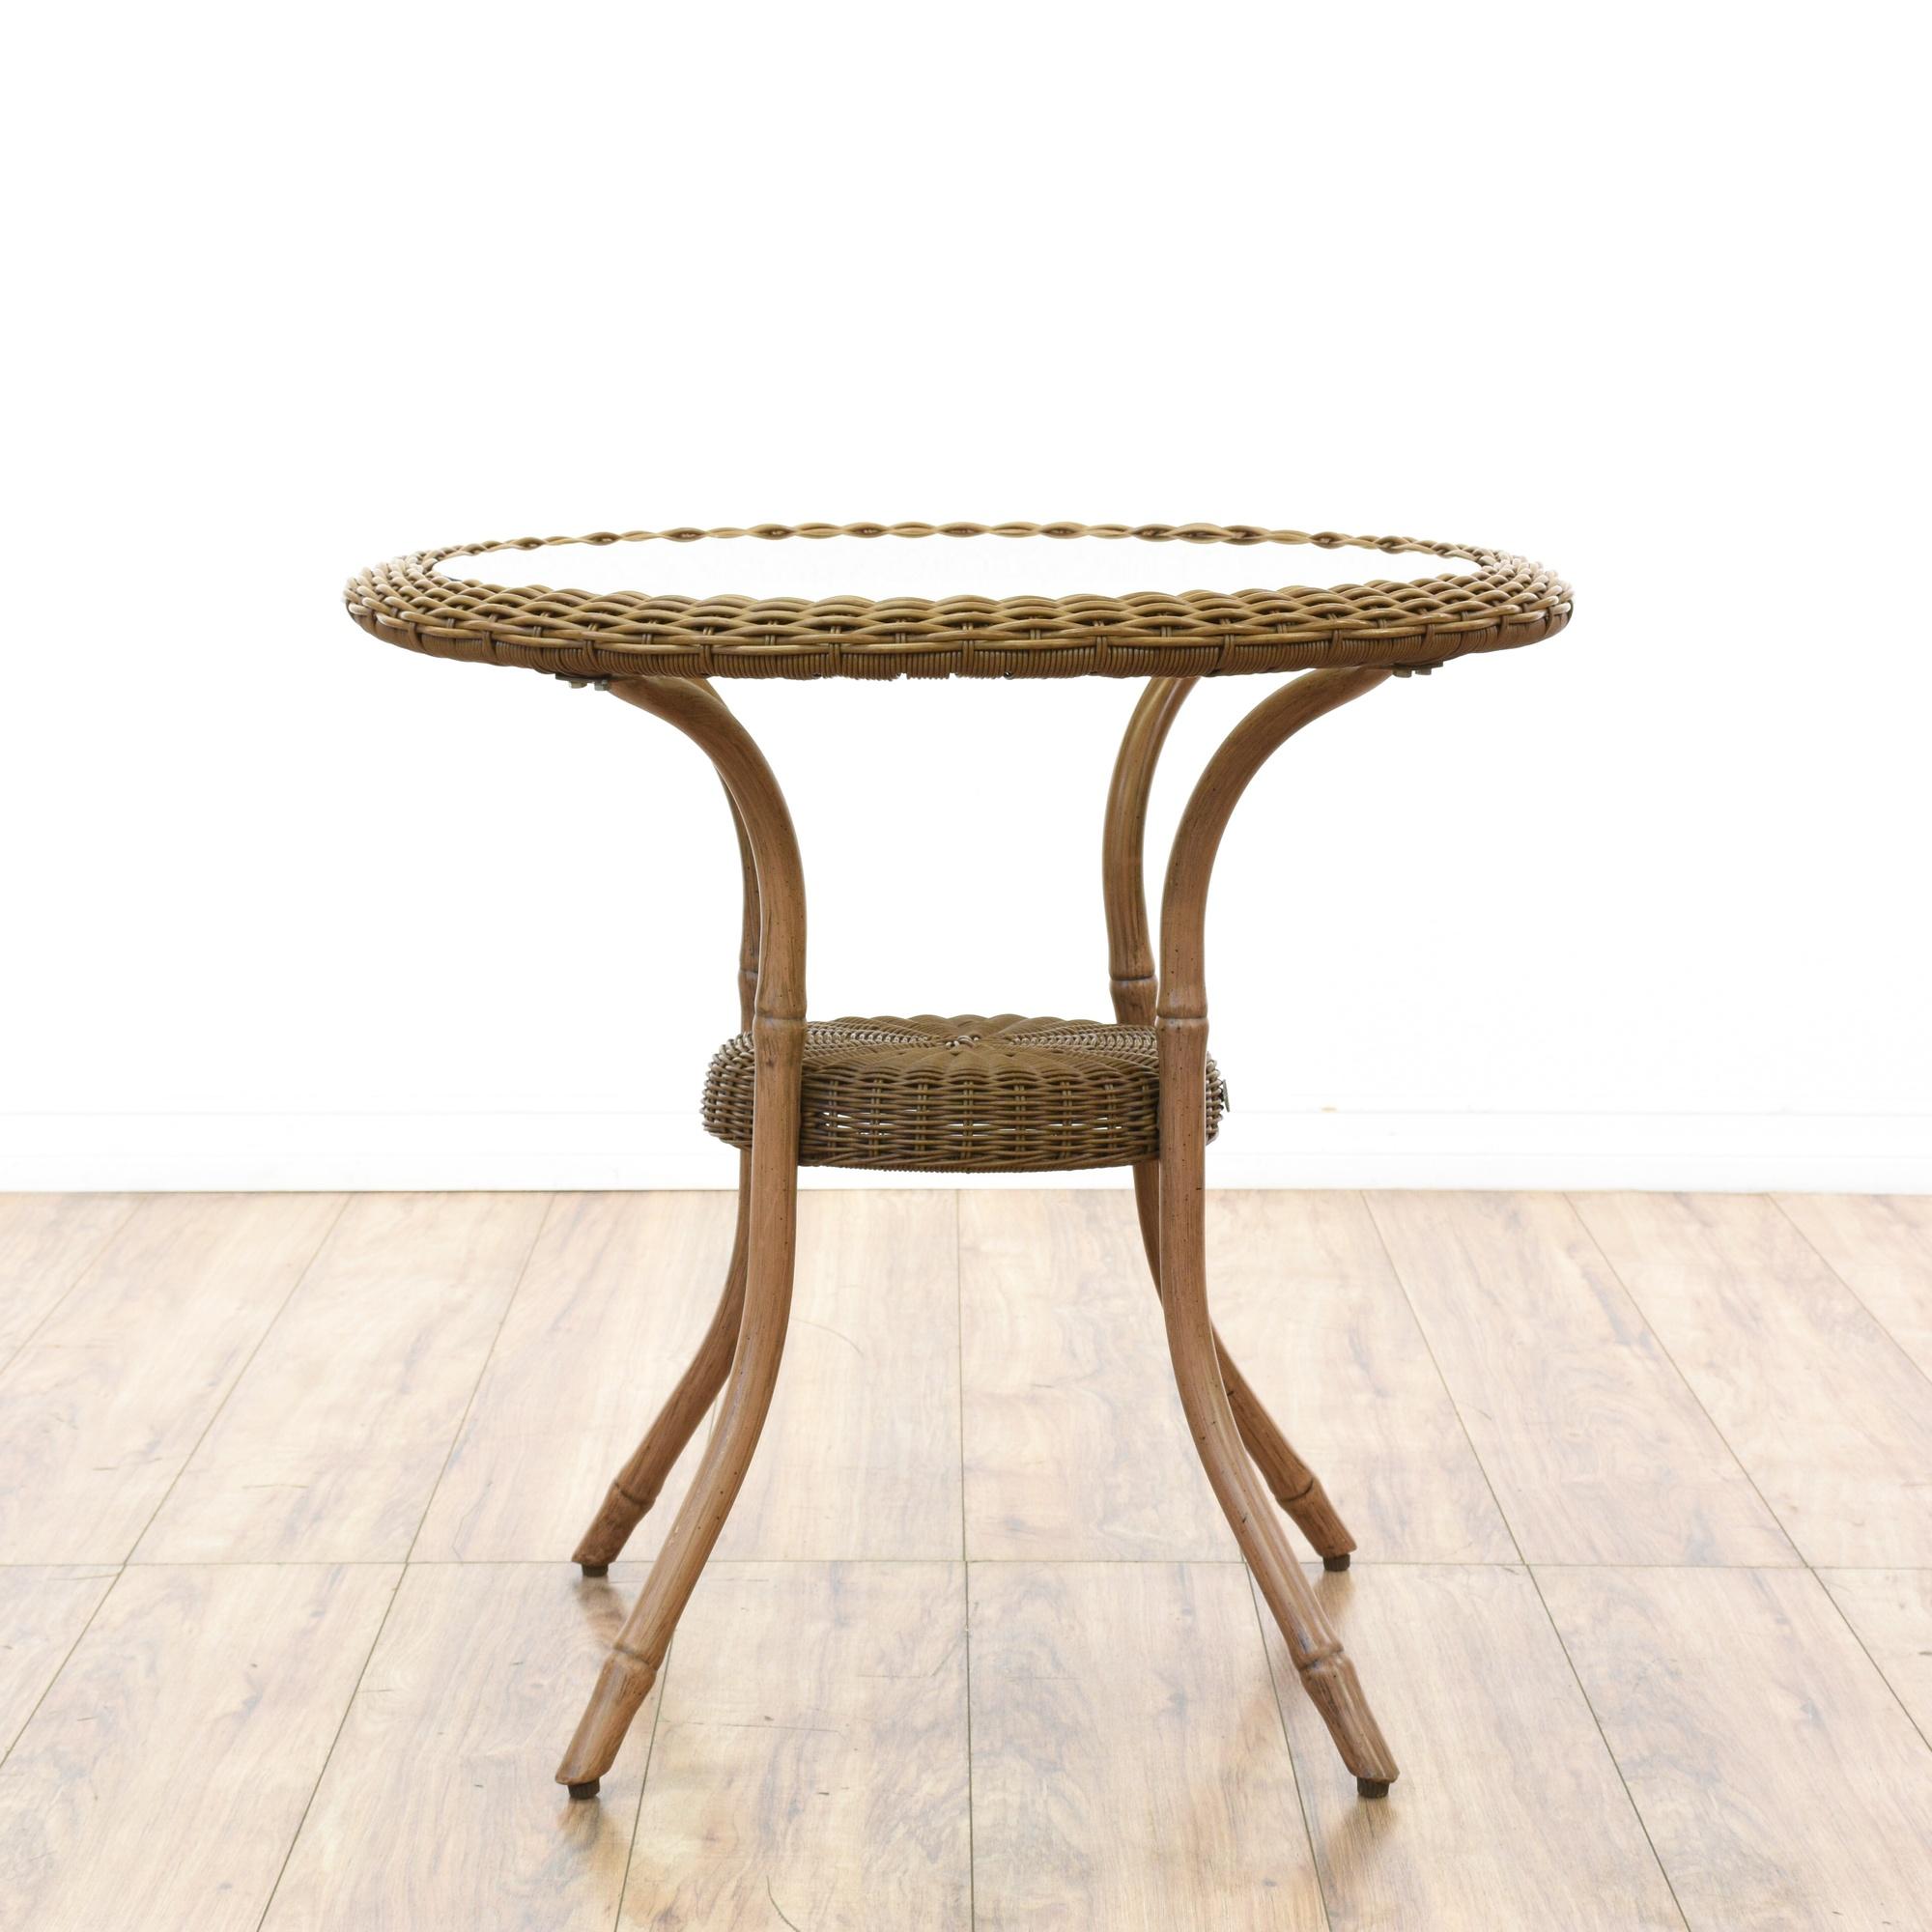 "Hampton Bay"" Glass & Wicker Patio End Table"